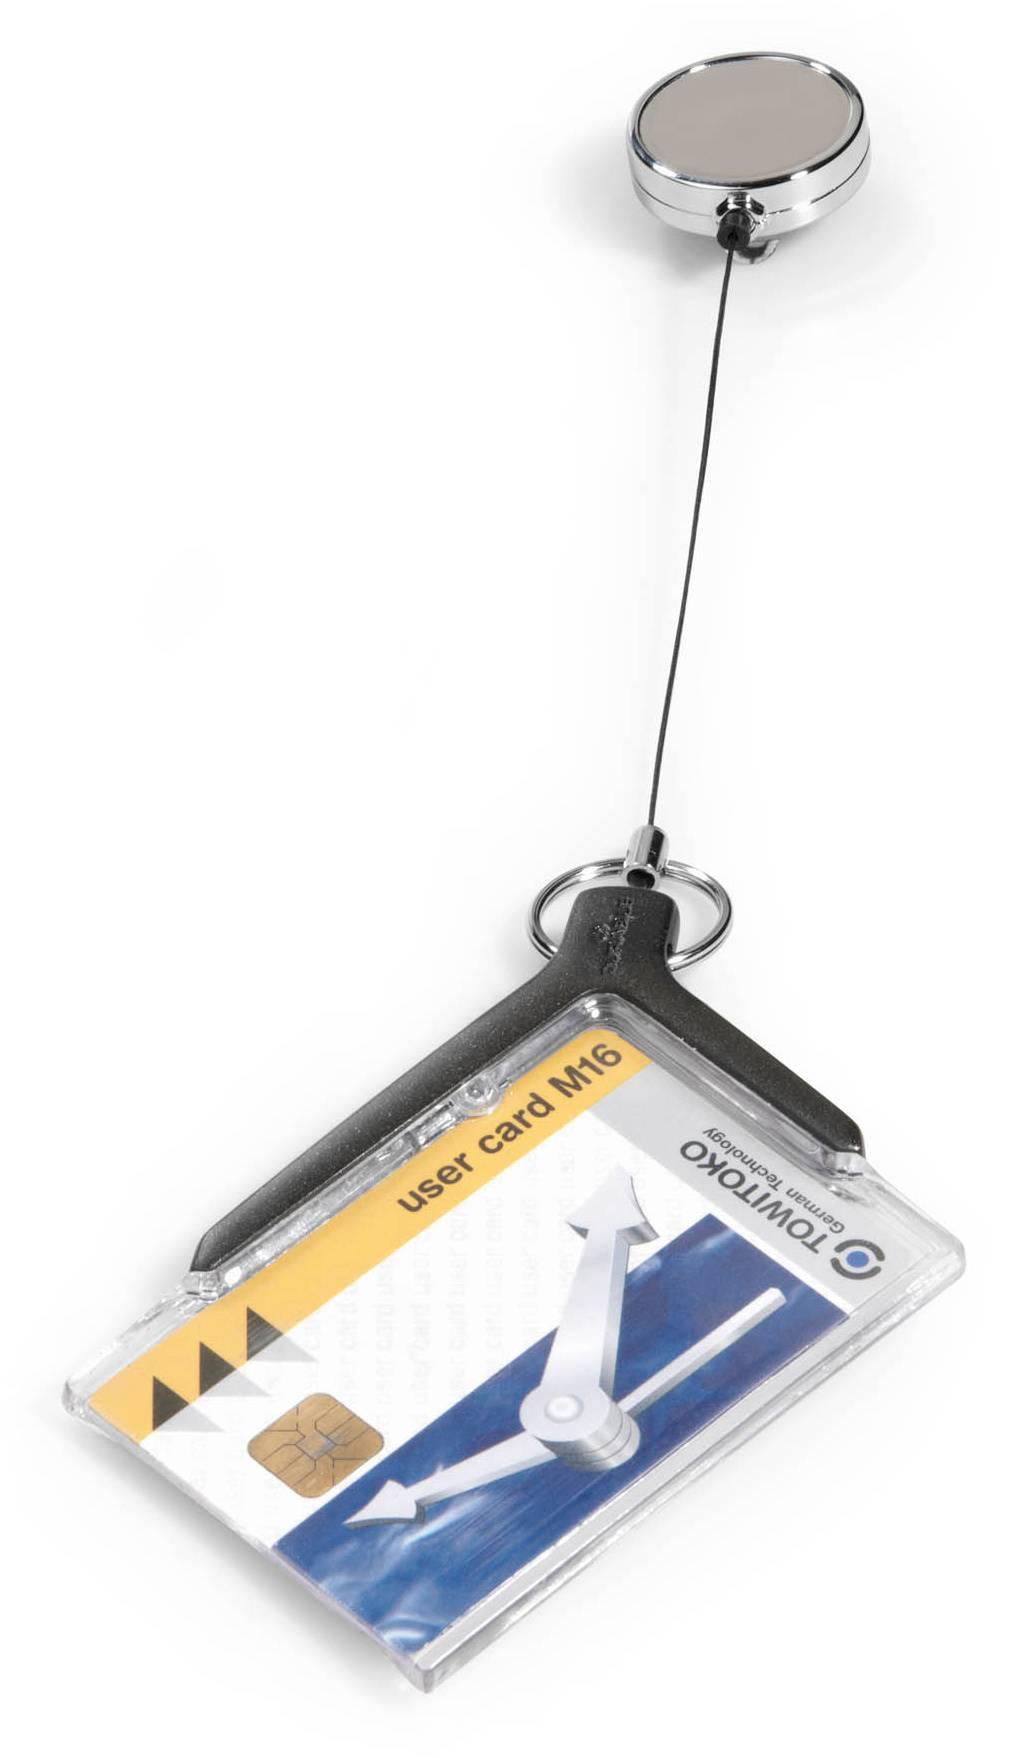 Держатель Durable CARD HOLDER DELUXE PRO 8307-58 серый - фото 1